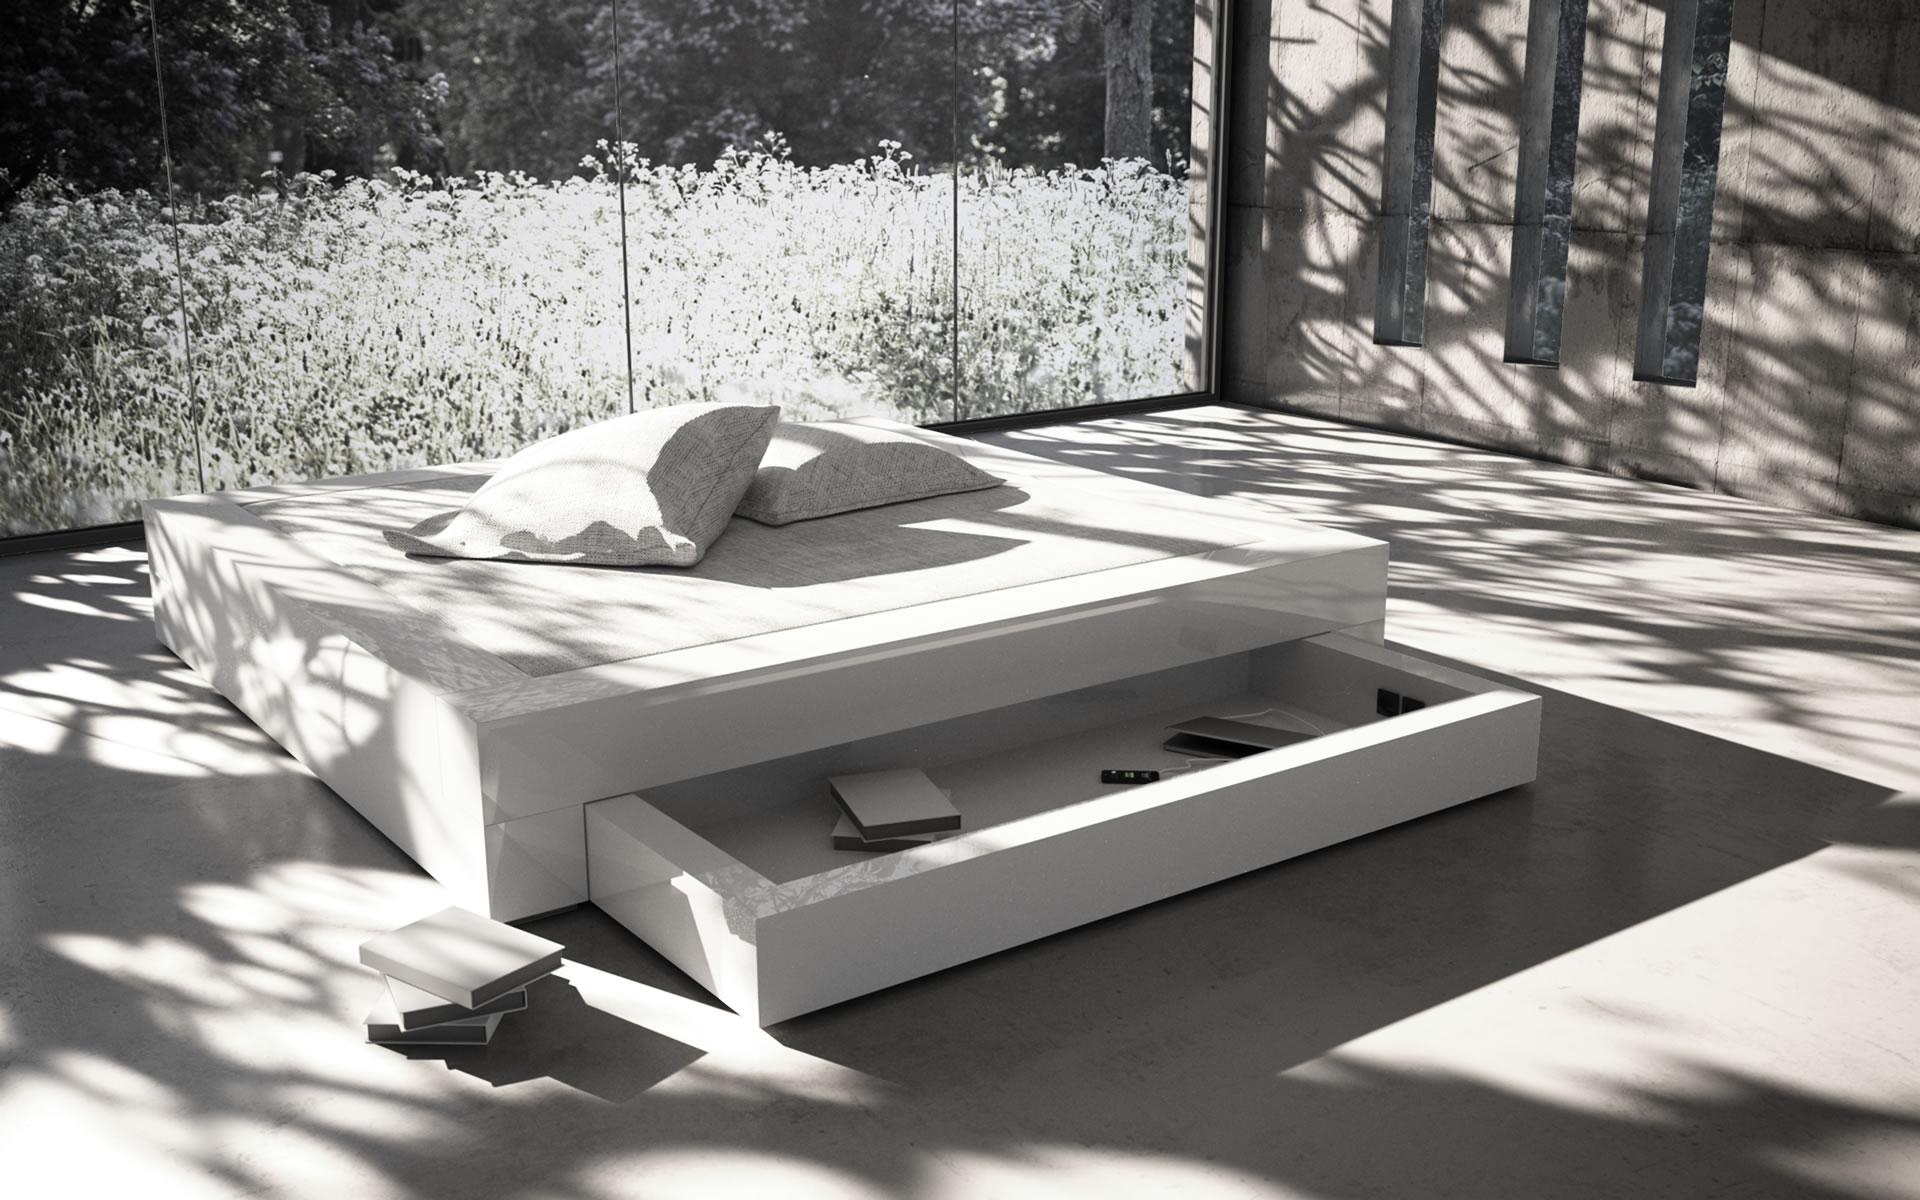 Bett somnium mit bettkasten preis 140x200 design bett for Bett design